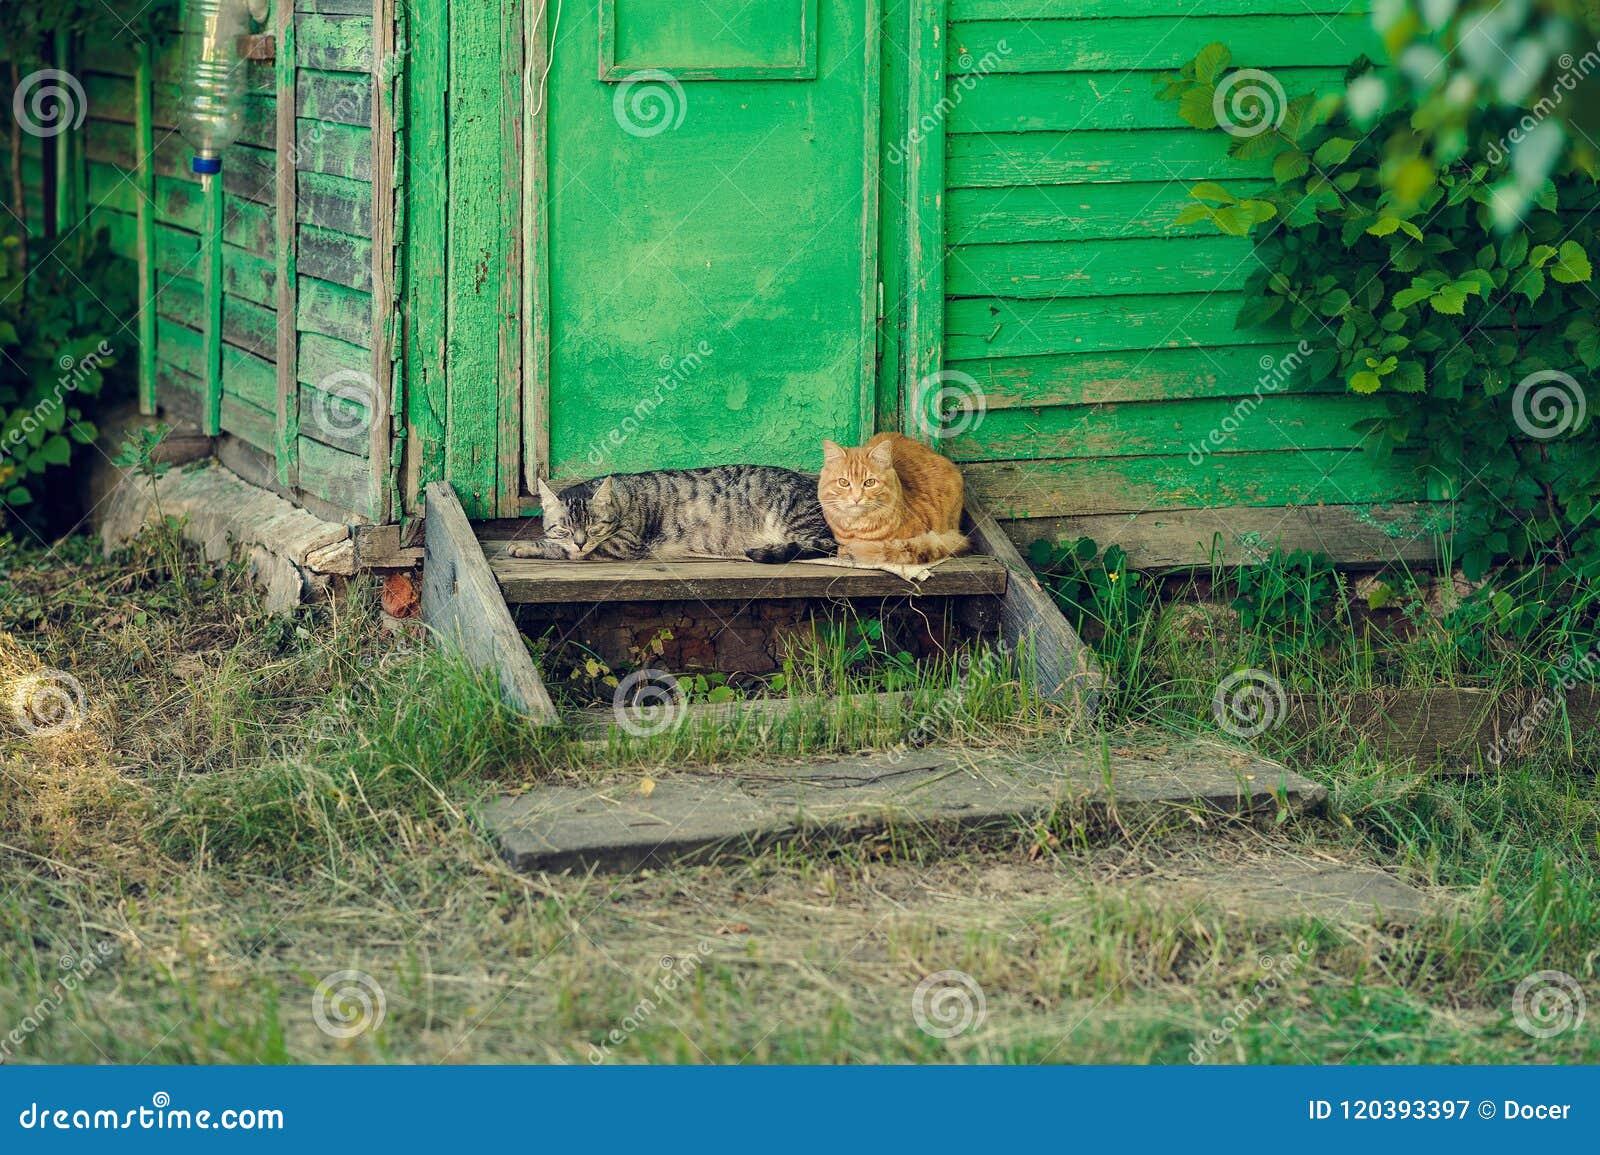 Descansar relaxa o gato de dois silêncios perto da porta verde de madeira